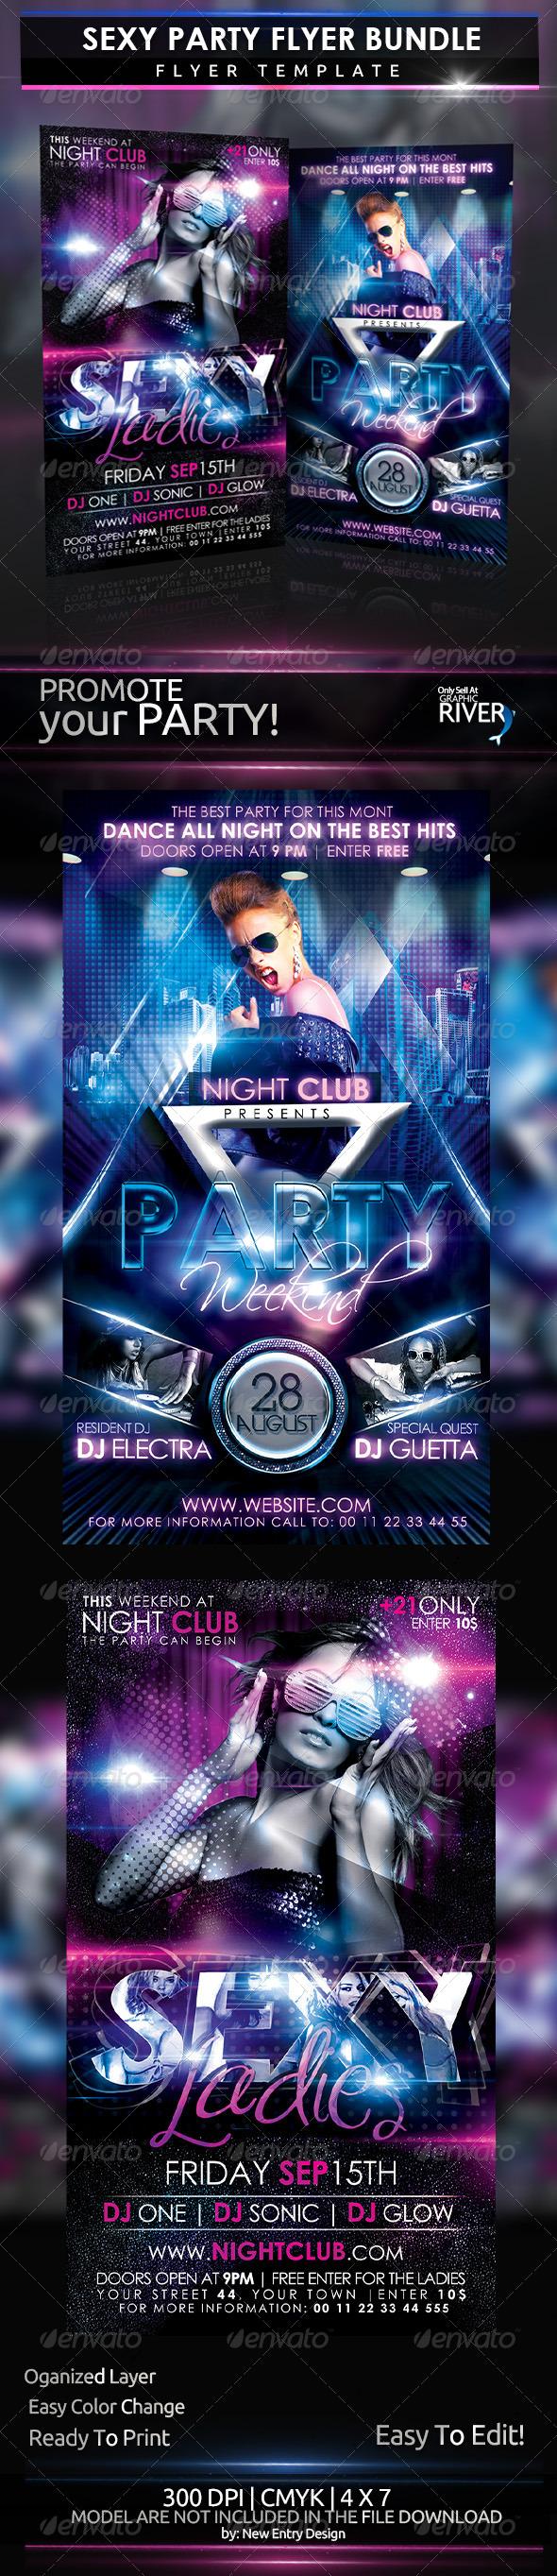 Sexy Party Flyer Bundle